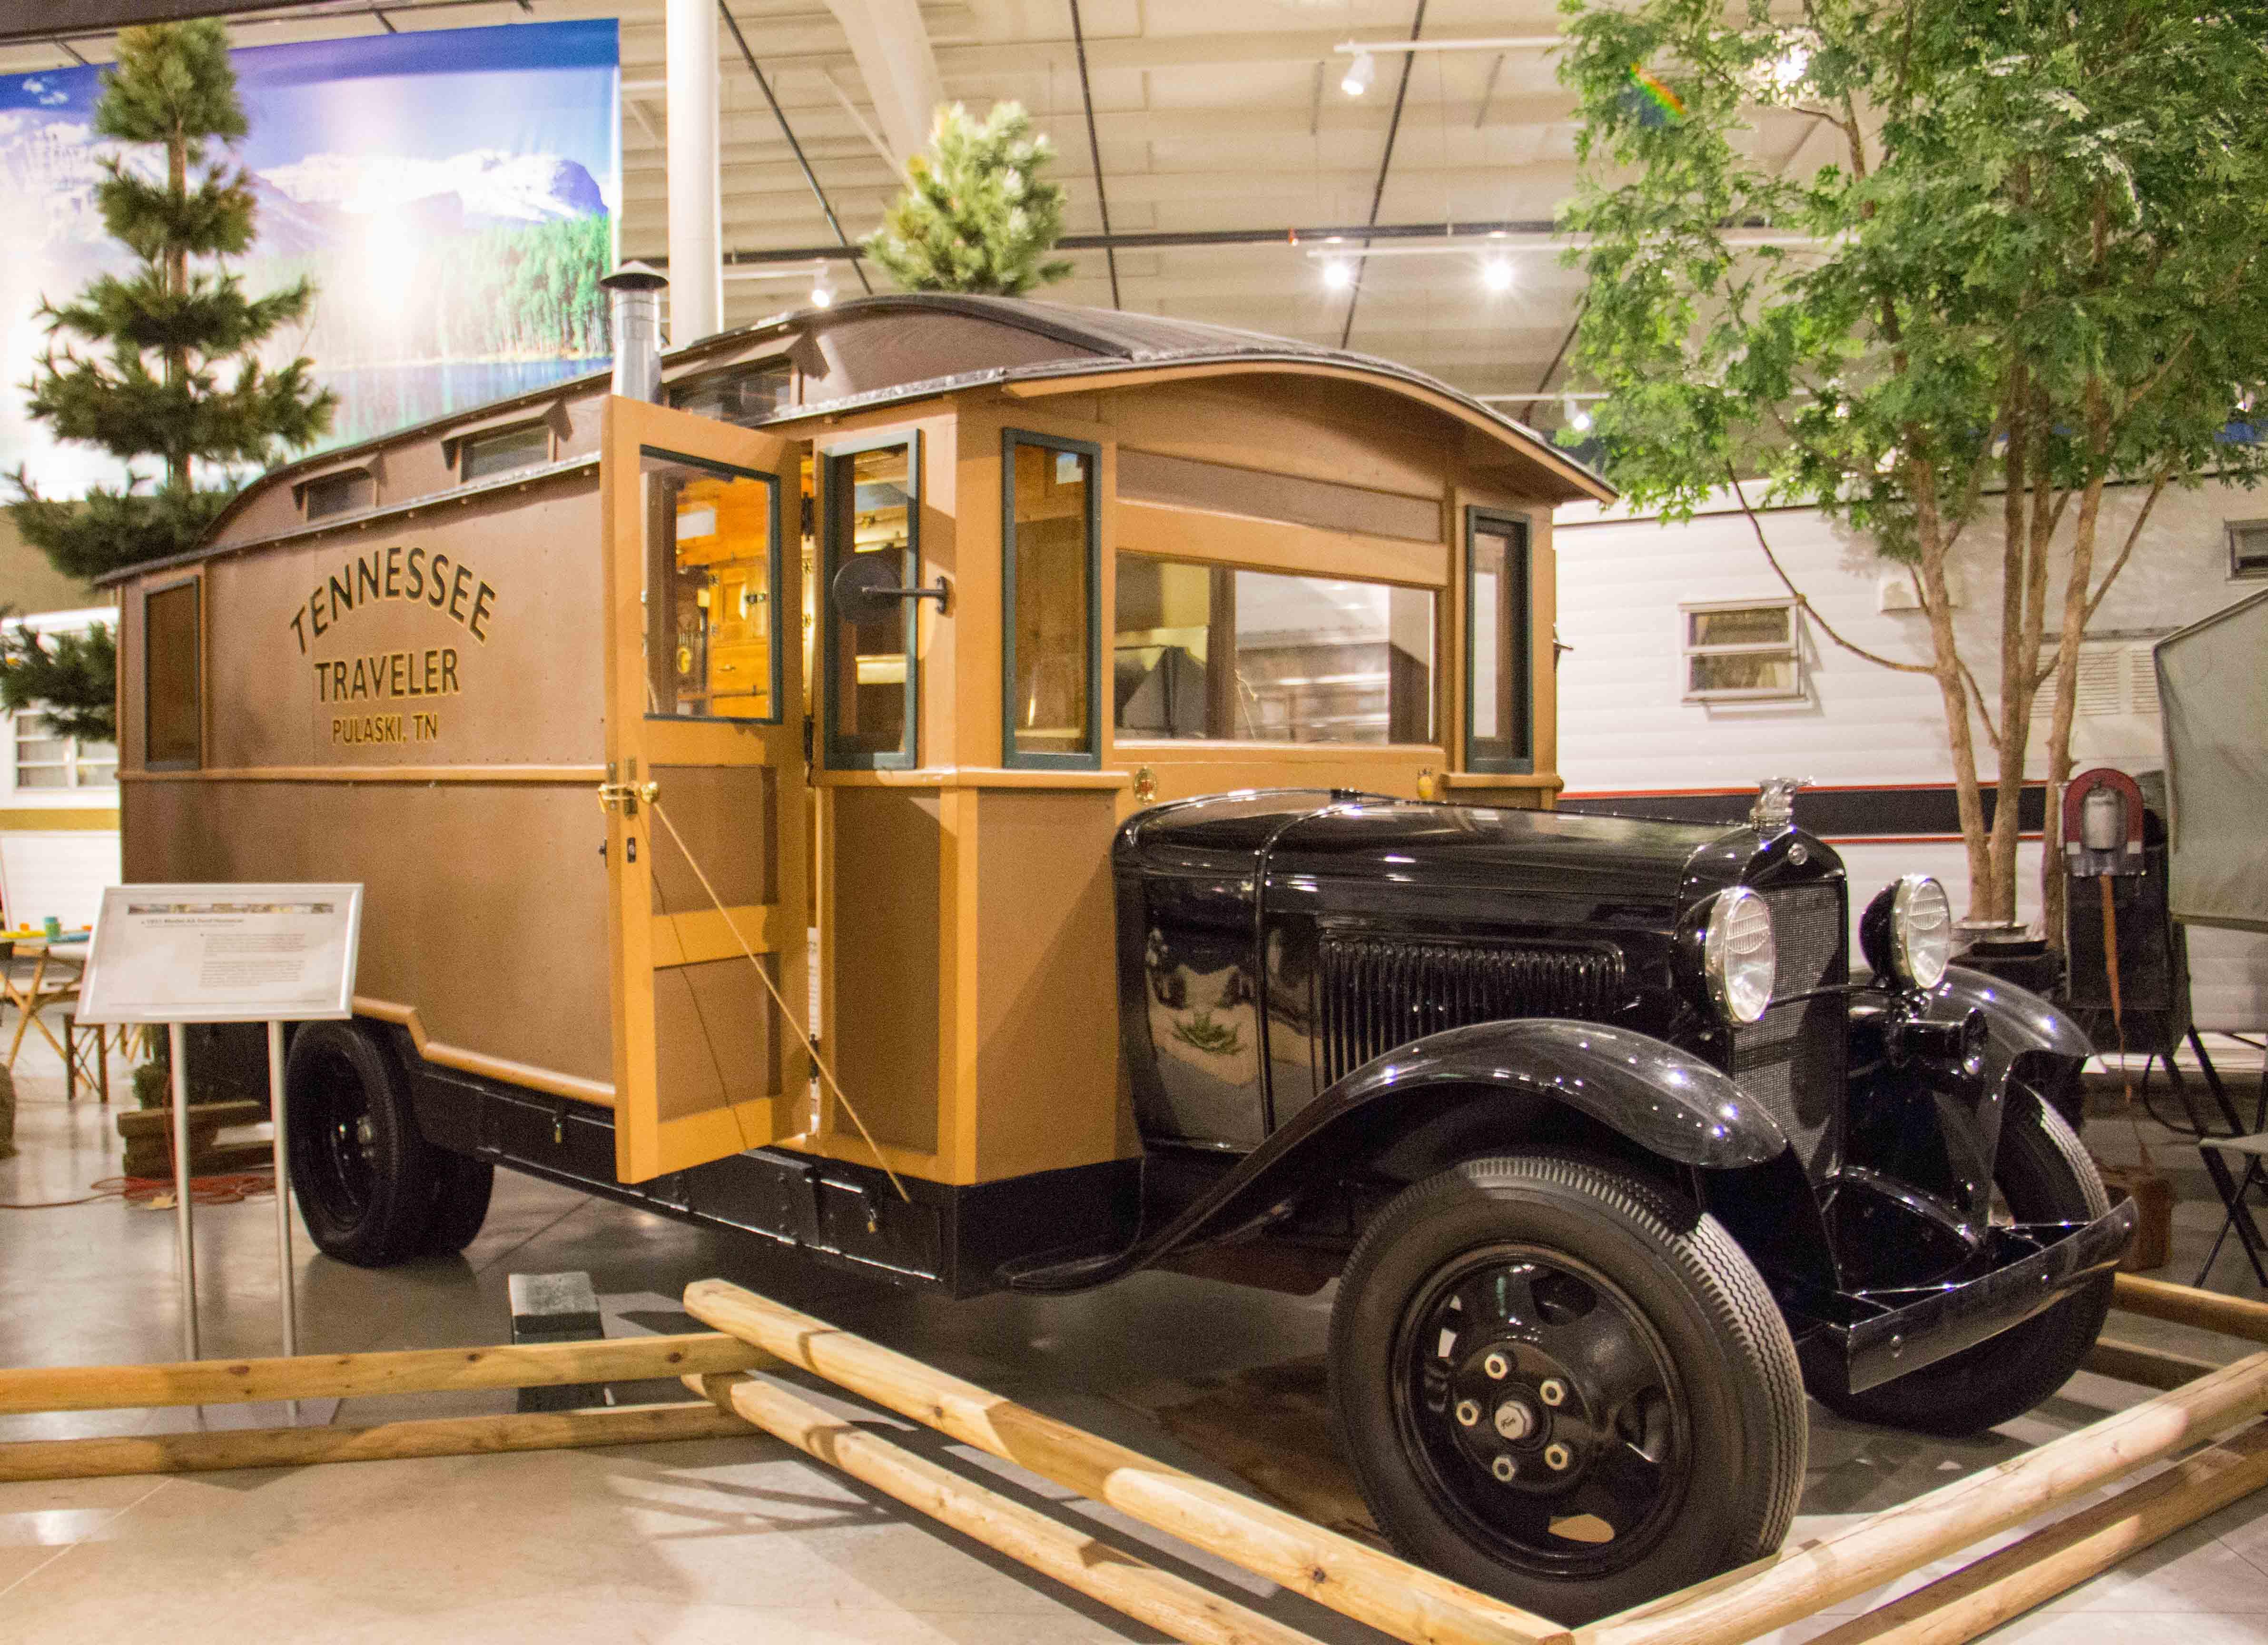 1931 Tennessee Traveler Housecar